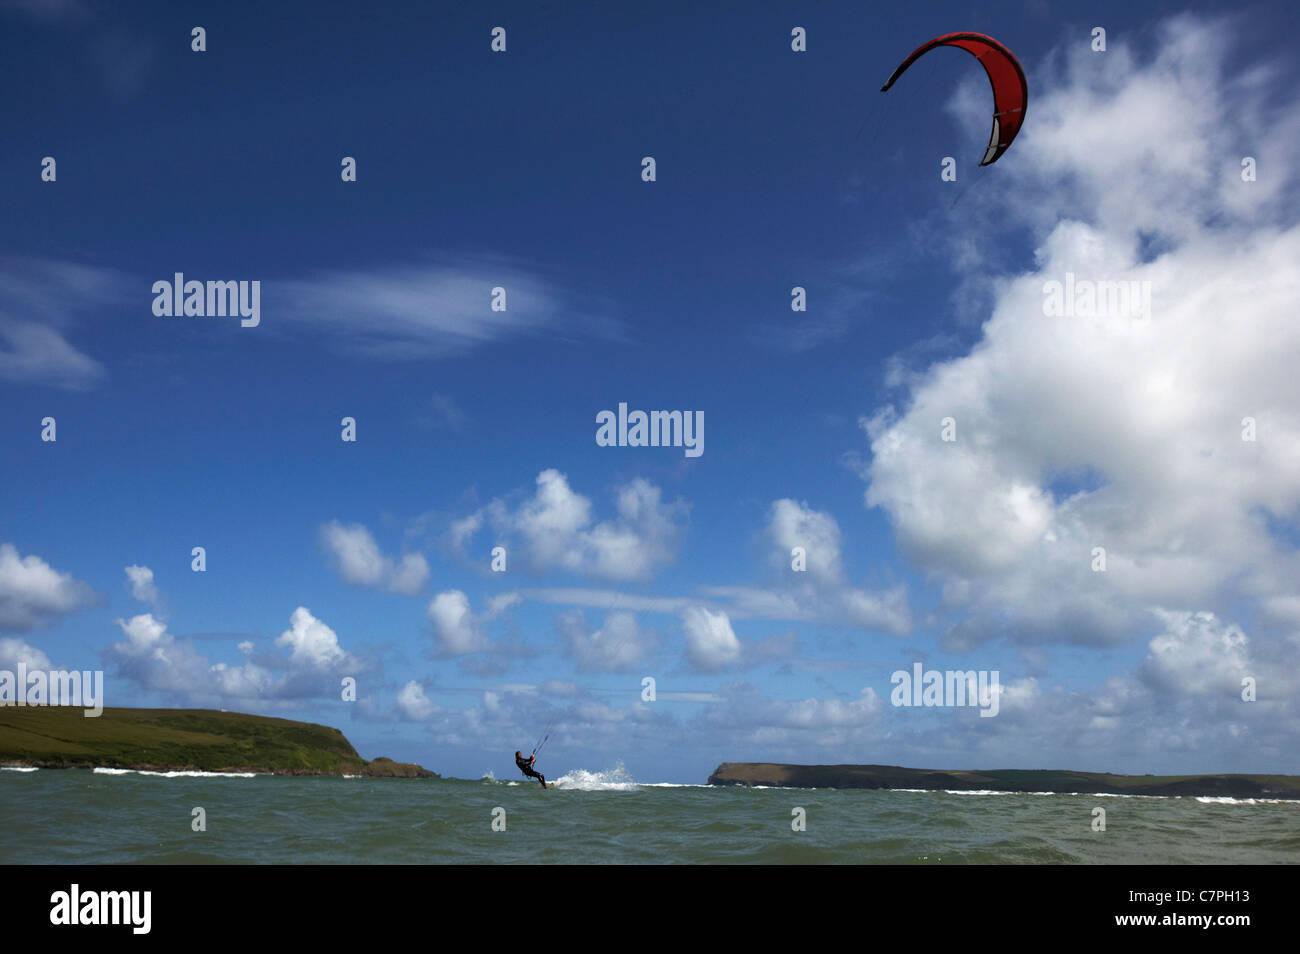 Kitesurfer auf dem Wasser unter blauem Himmel Stockbild